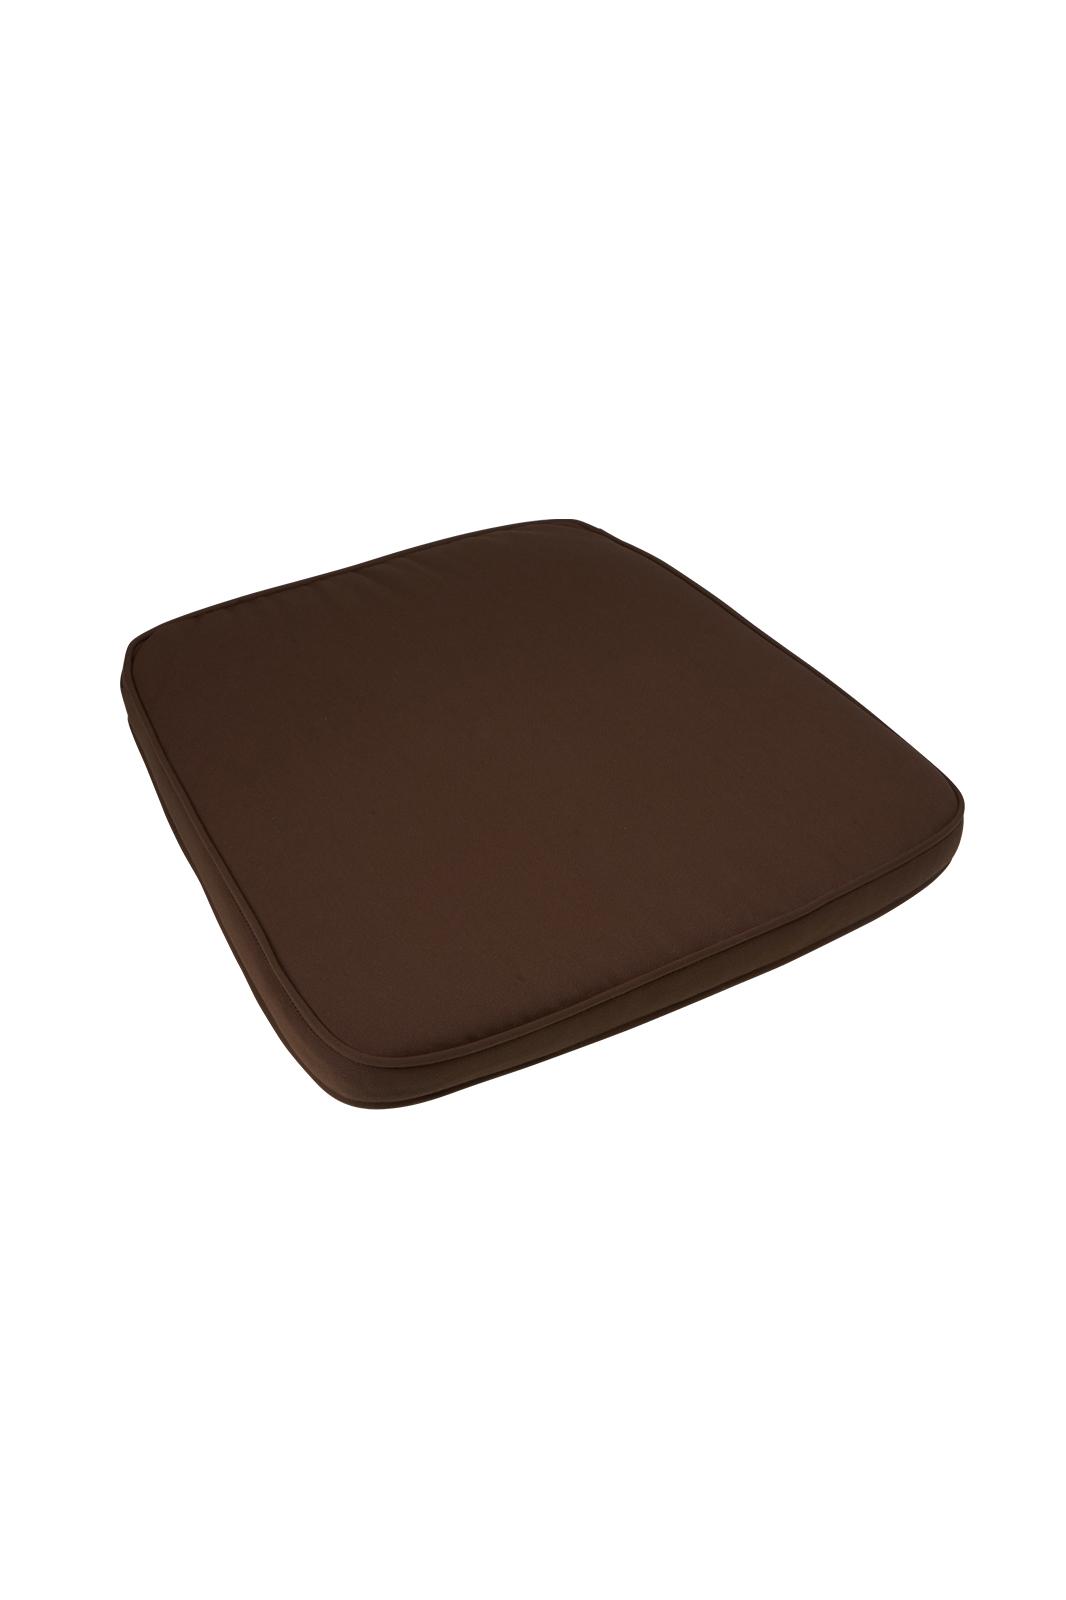 Kissen Braun 3504 Sessel